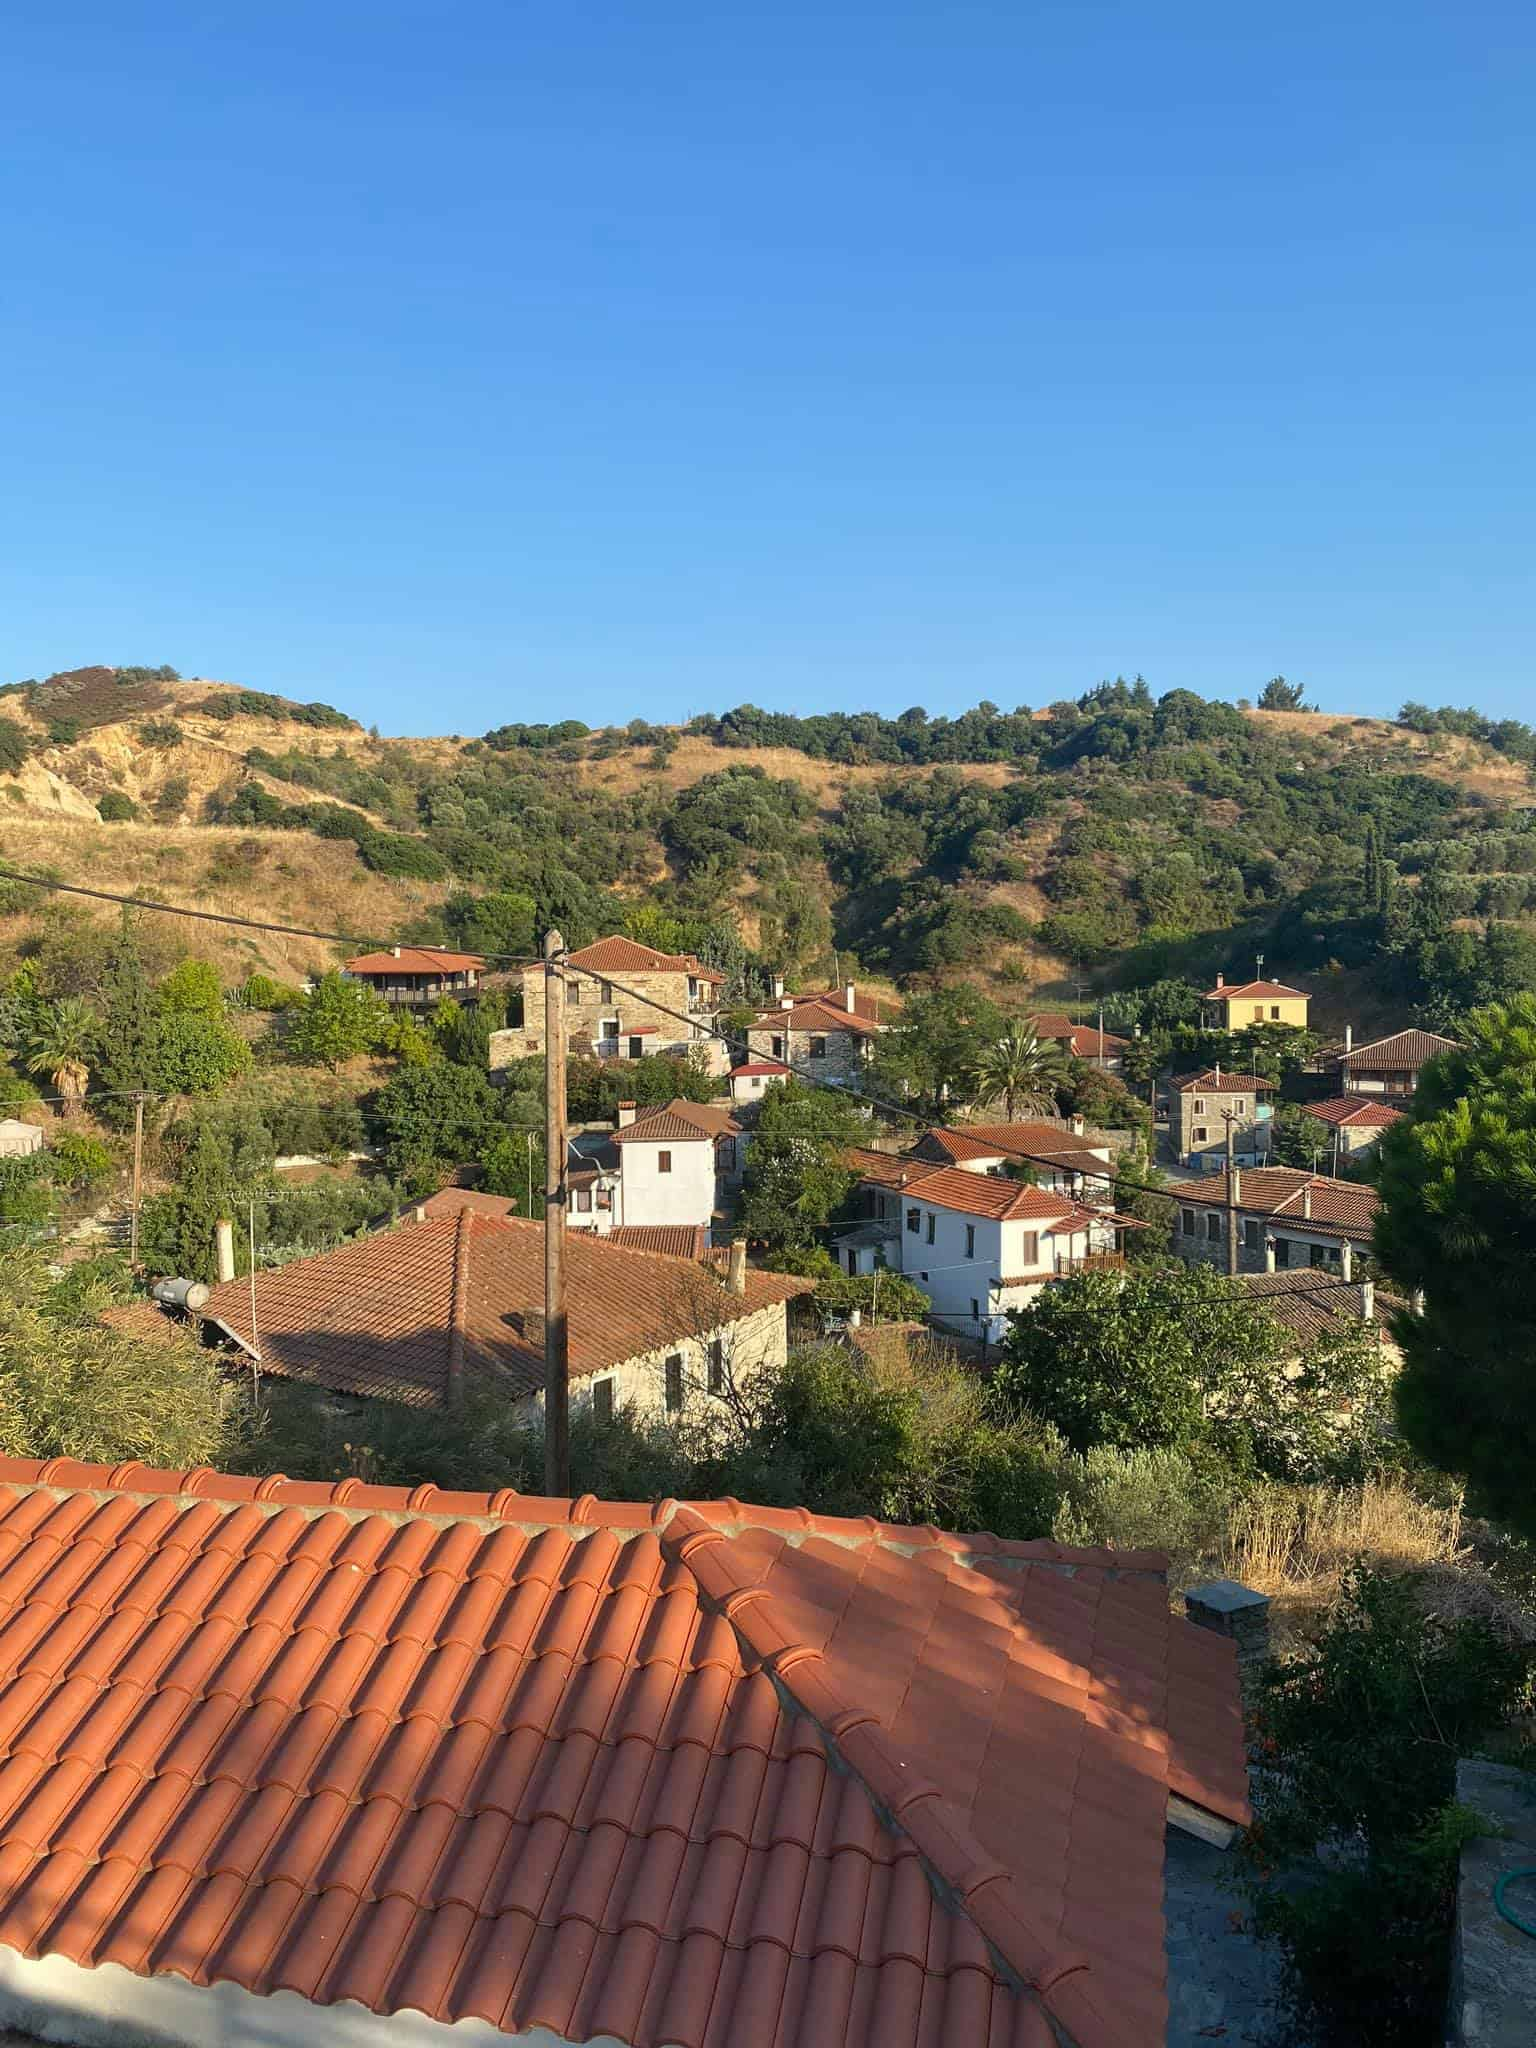 Viewpoint from Agios Nikitas courtyard